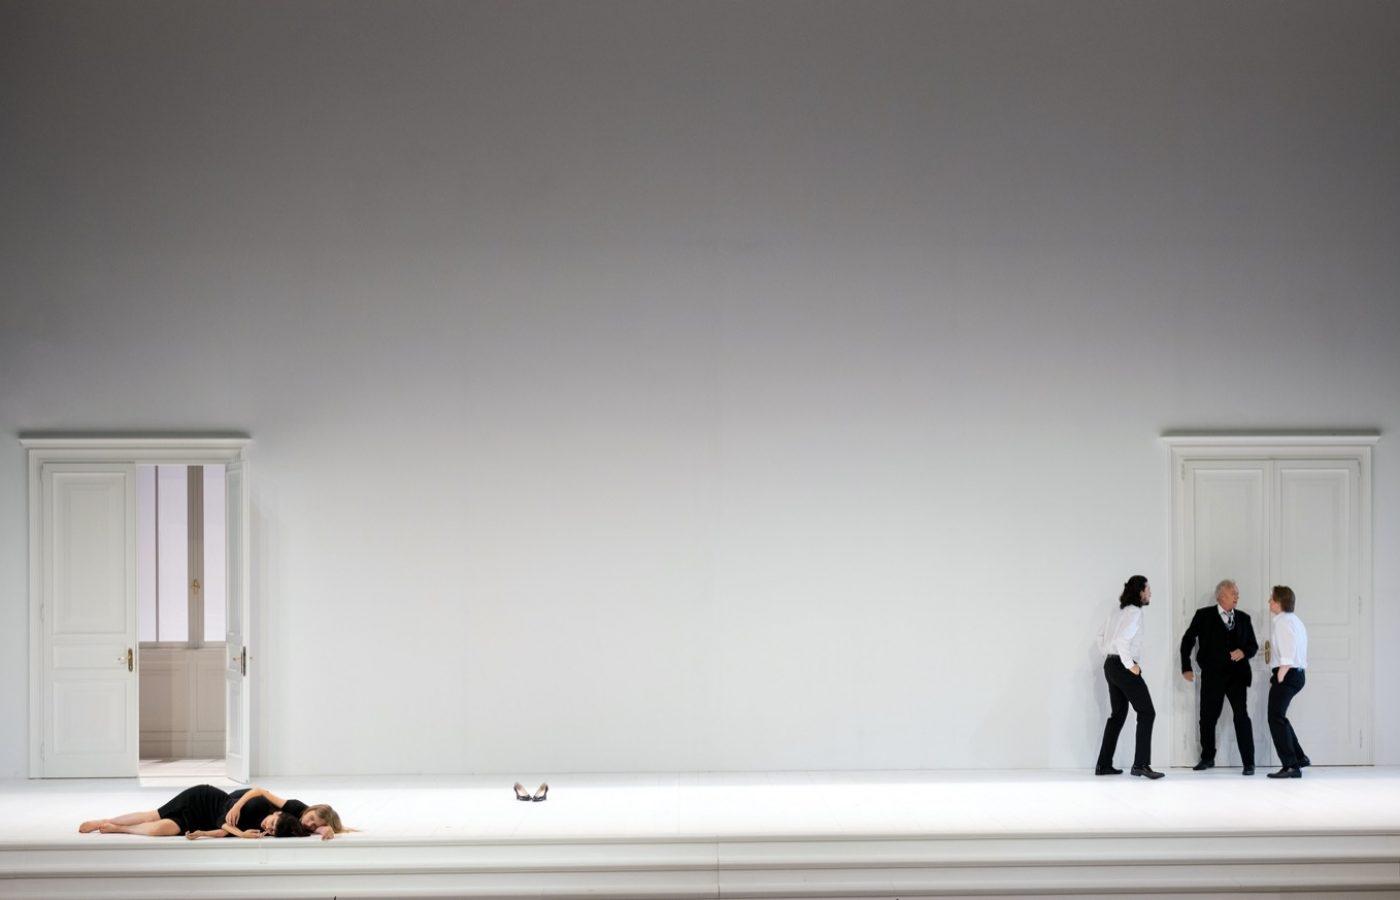 Leiacker-Loy-Cosi-Fan-Tutte-Monika-Rittershaus-Salzburger-Festspiele-2020-00114